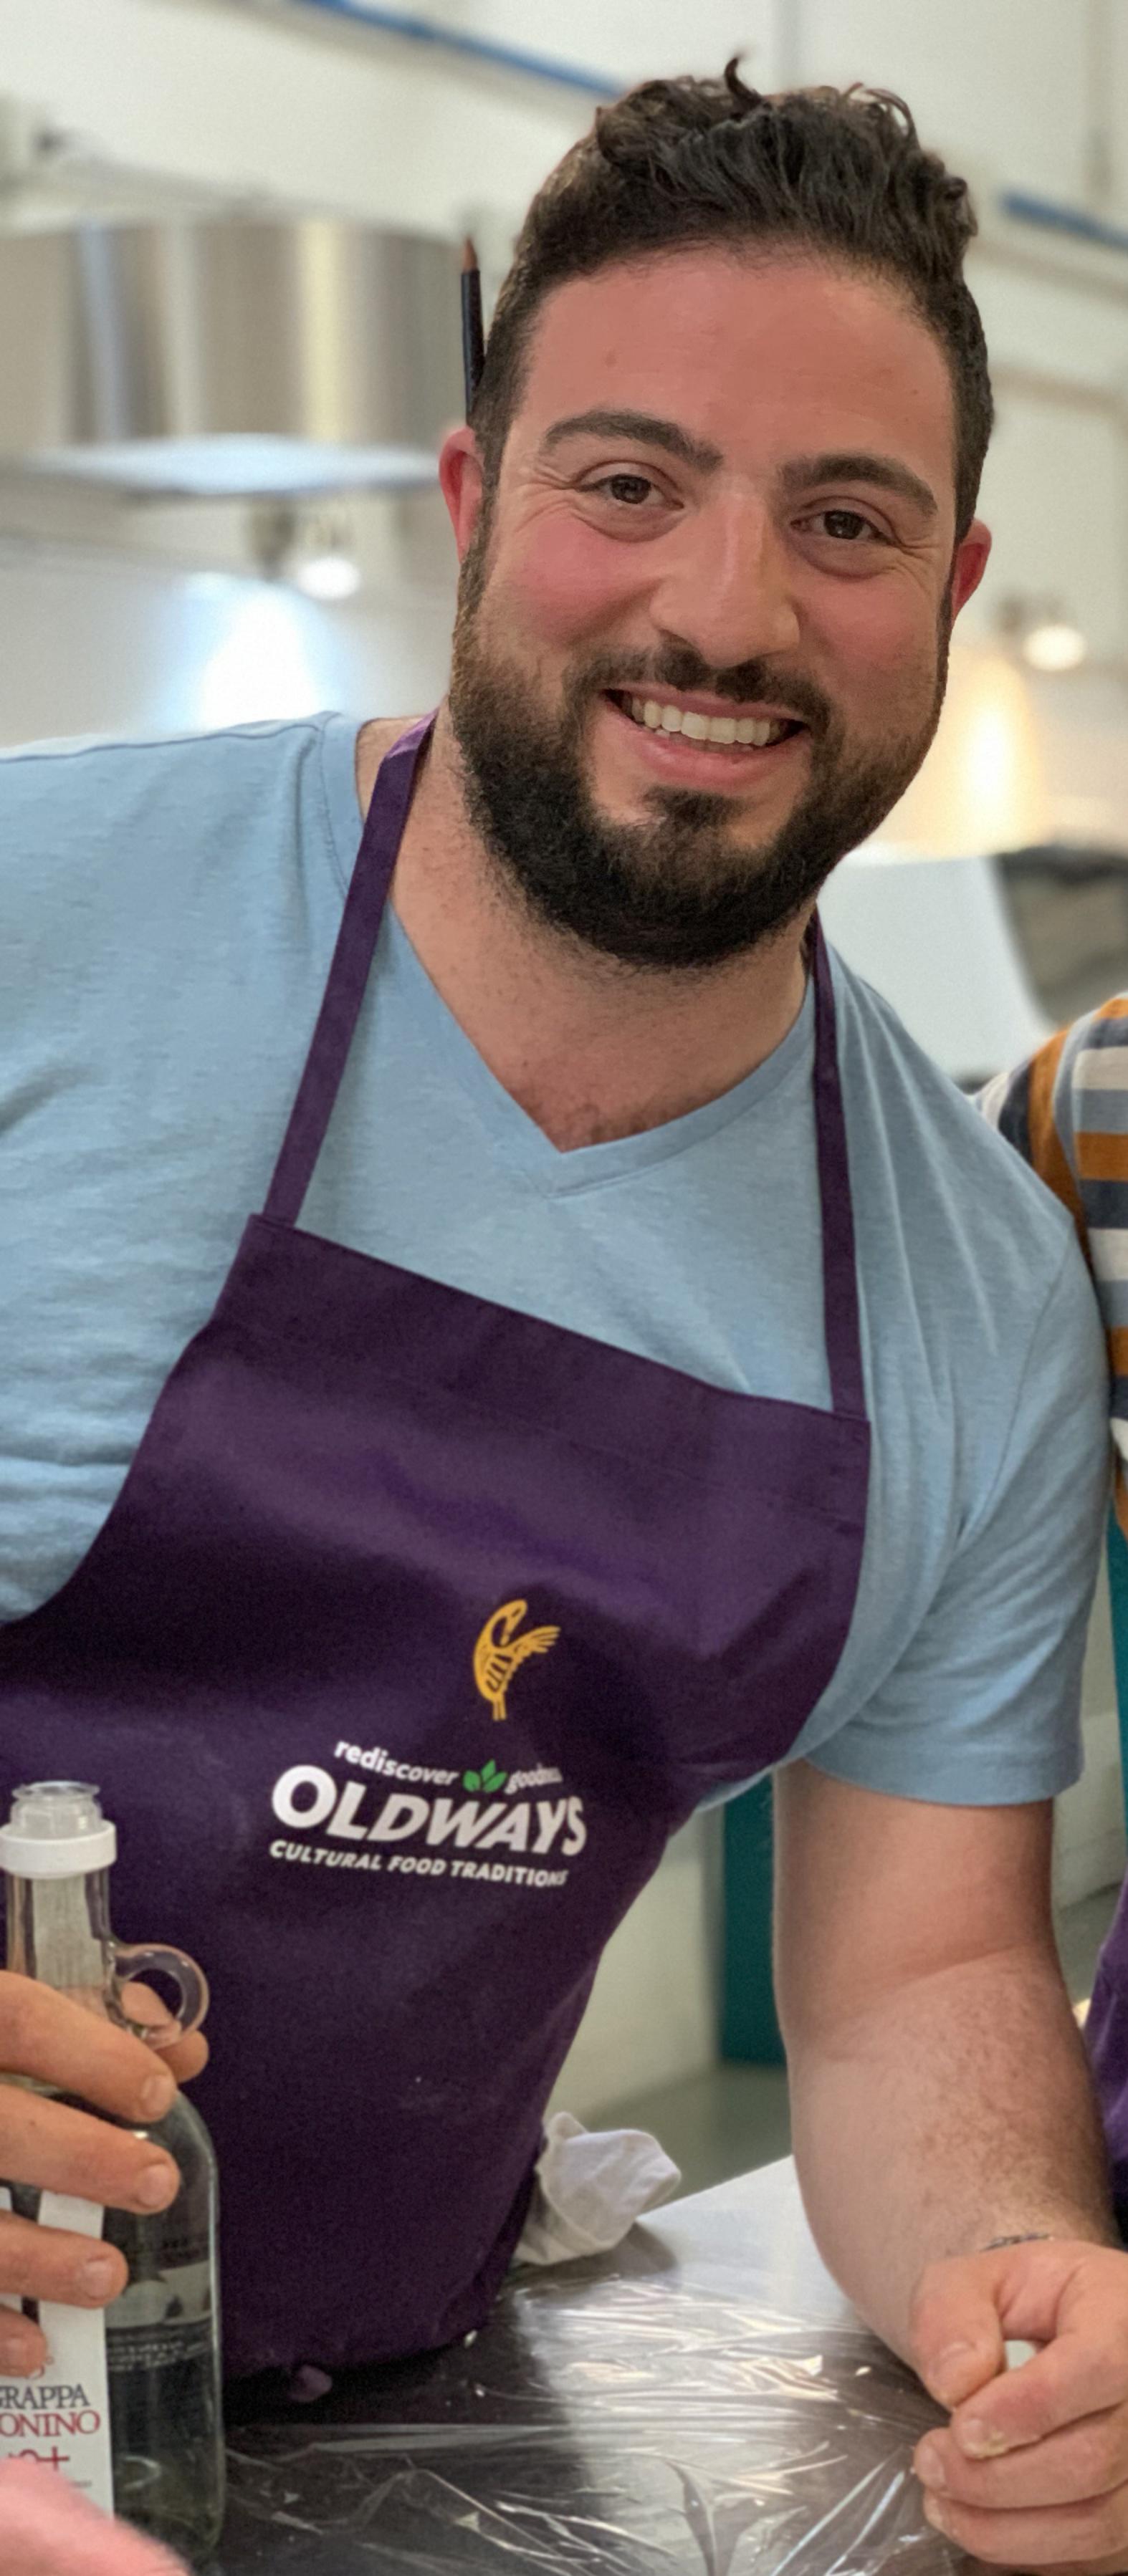 Chef Michael Lombardi in Italy